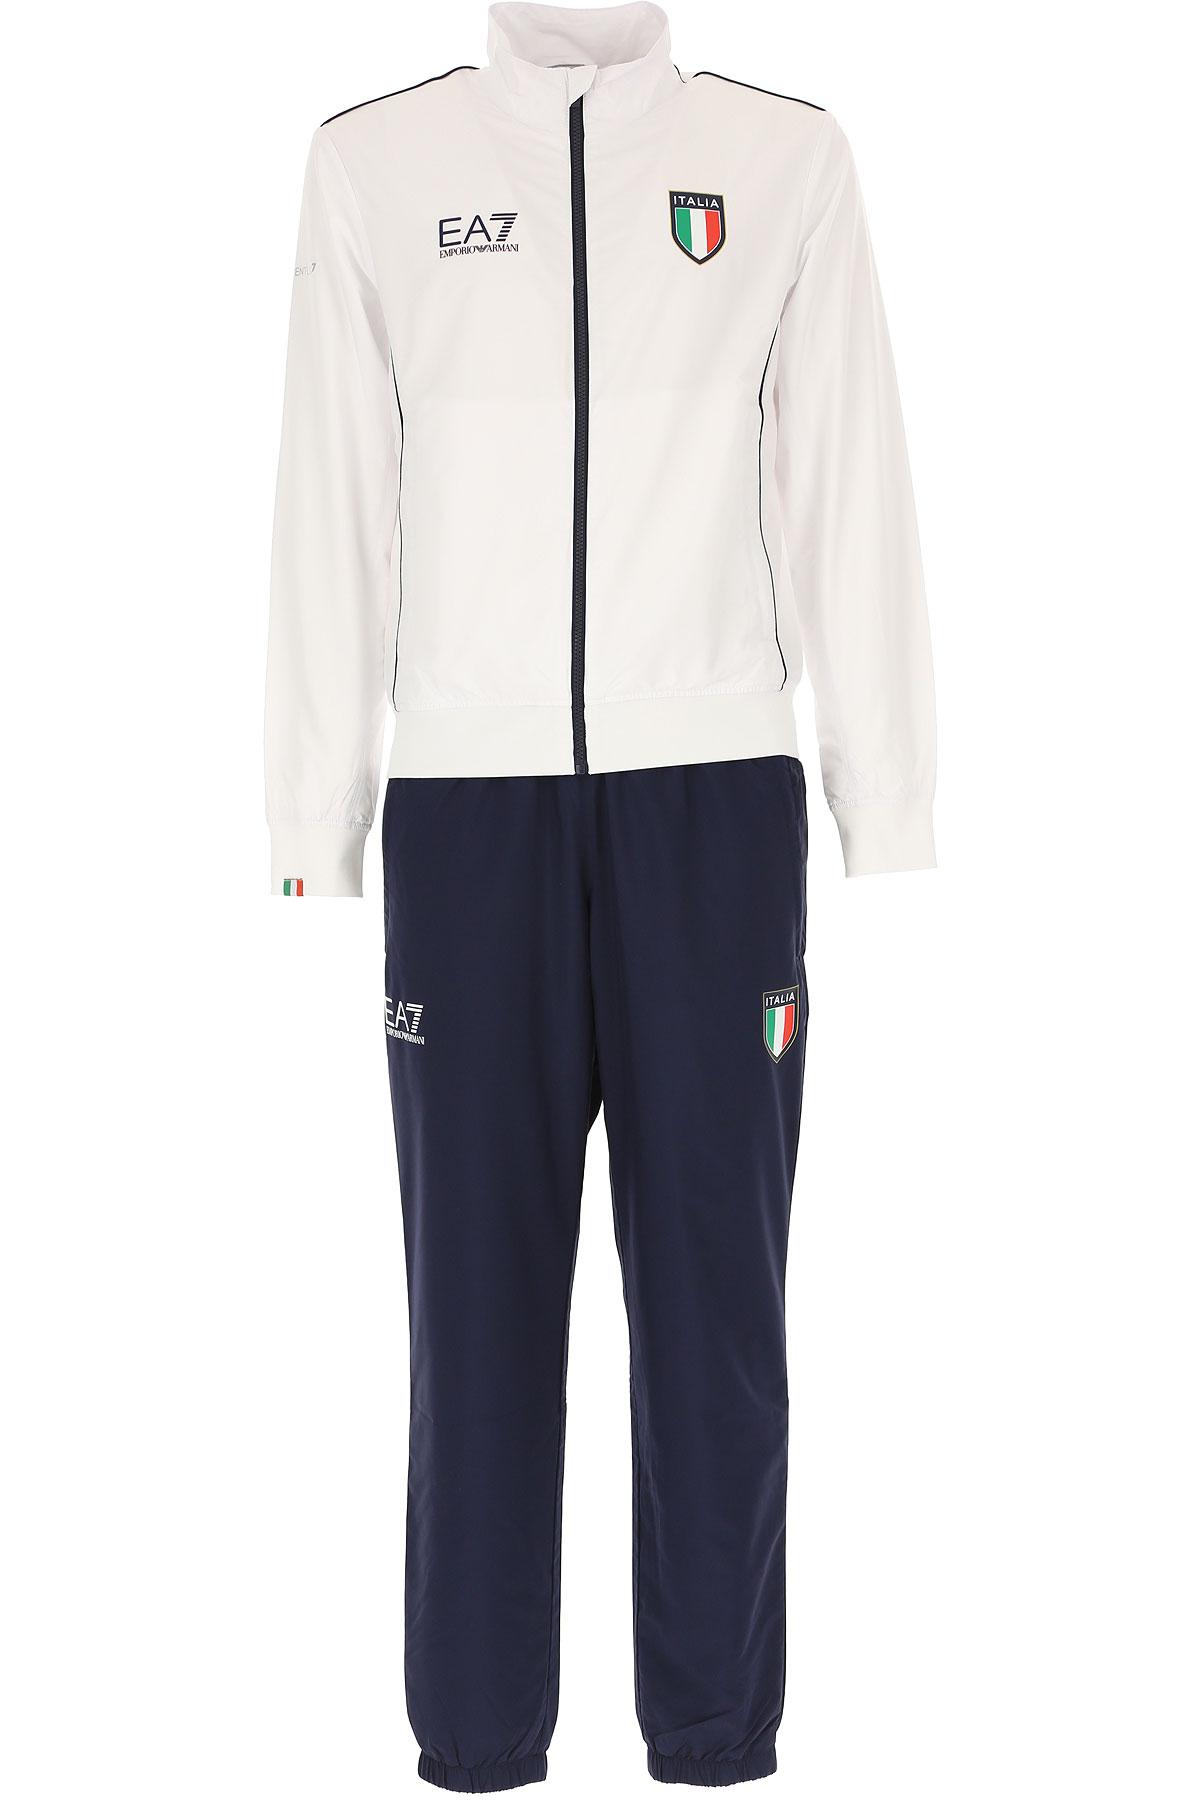 EMPORIO ARMANI Sportoberteile | Emporio Armani Sportbekleidung  Sport Kleidung, Sport Mode, Weiss